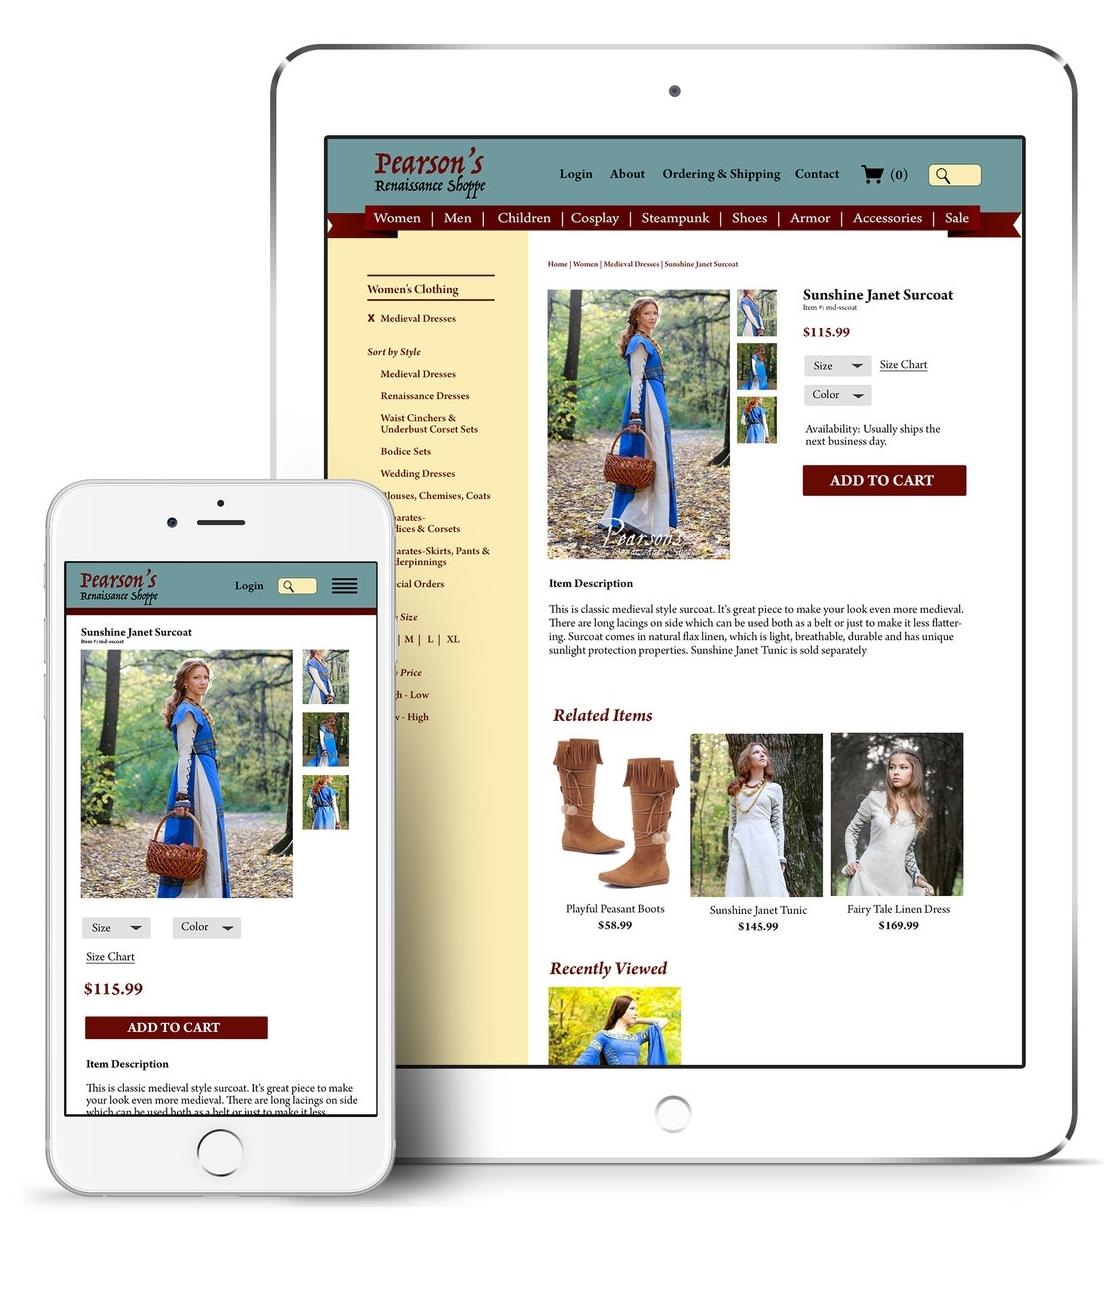 Pearson'siPad-iPhone2.jpg